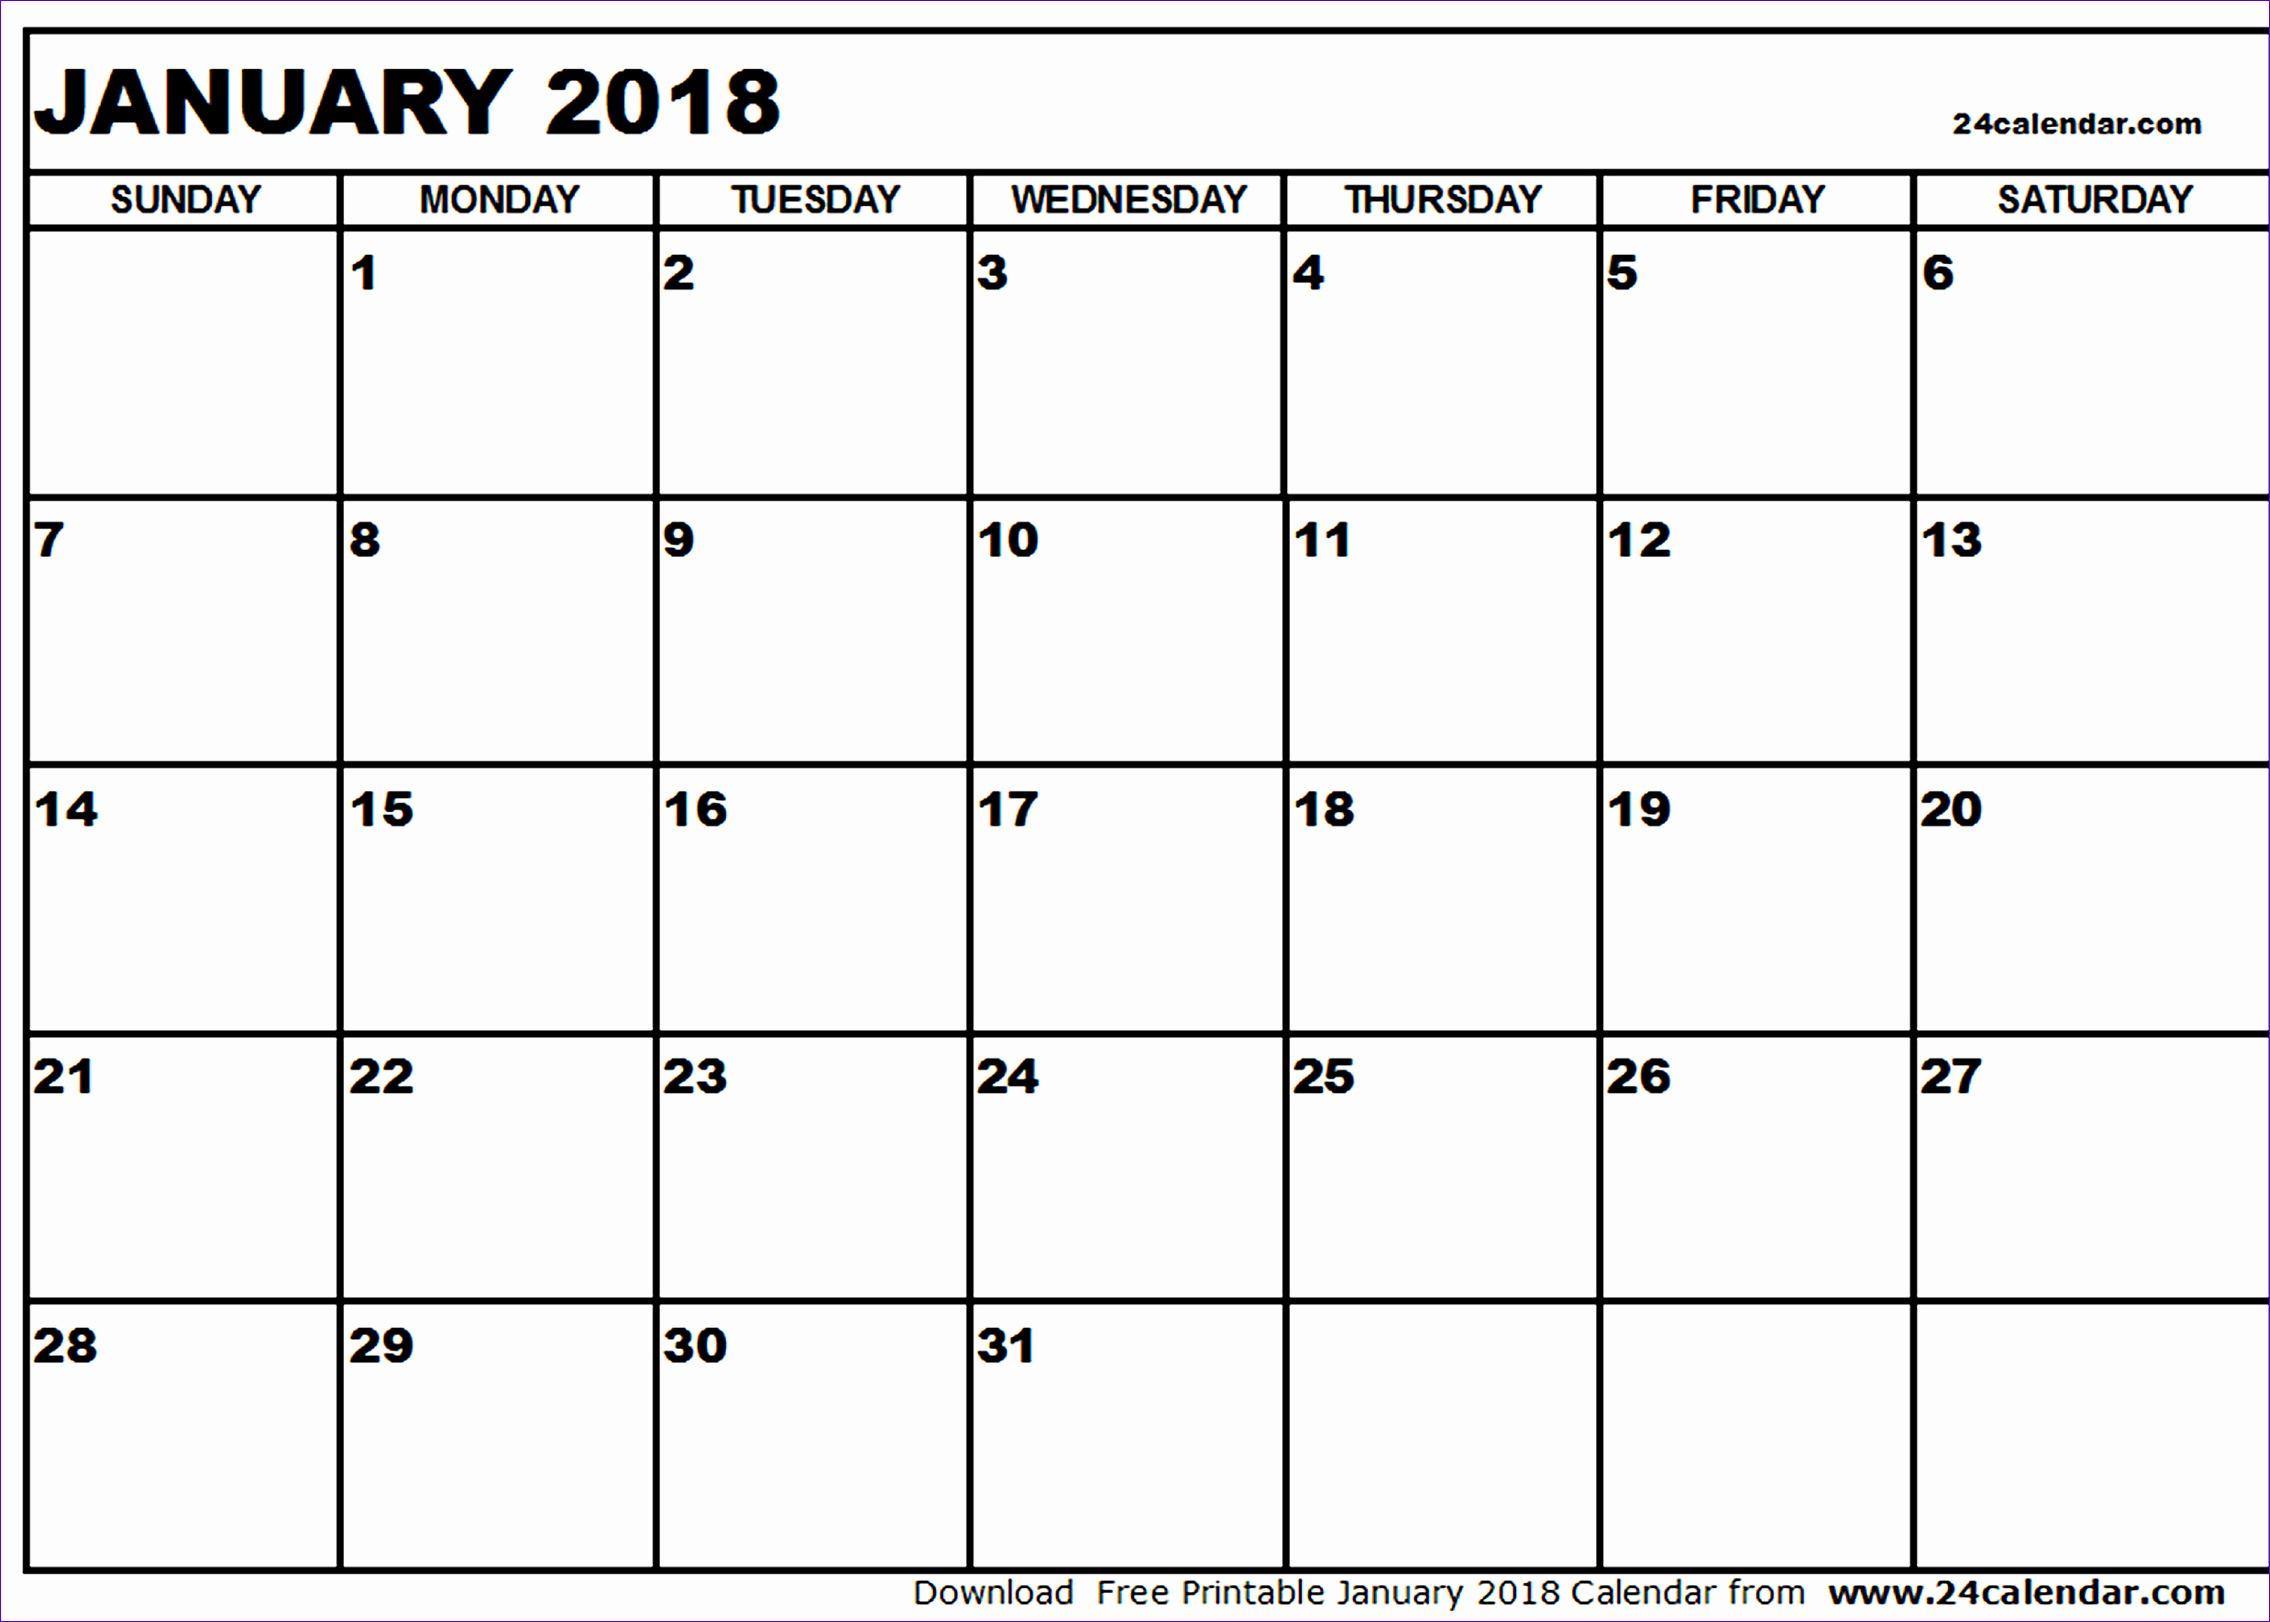 january 2018 calendar template 1298 22701622